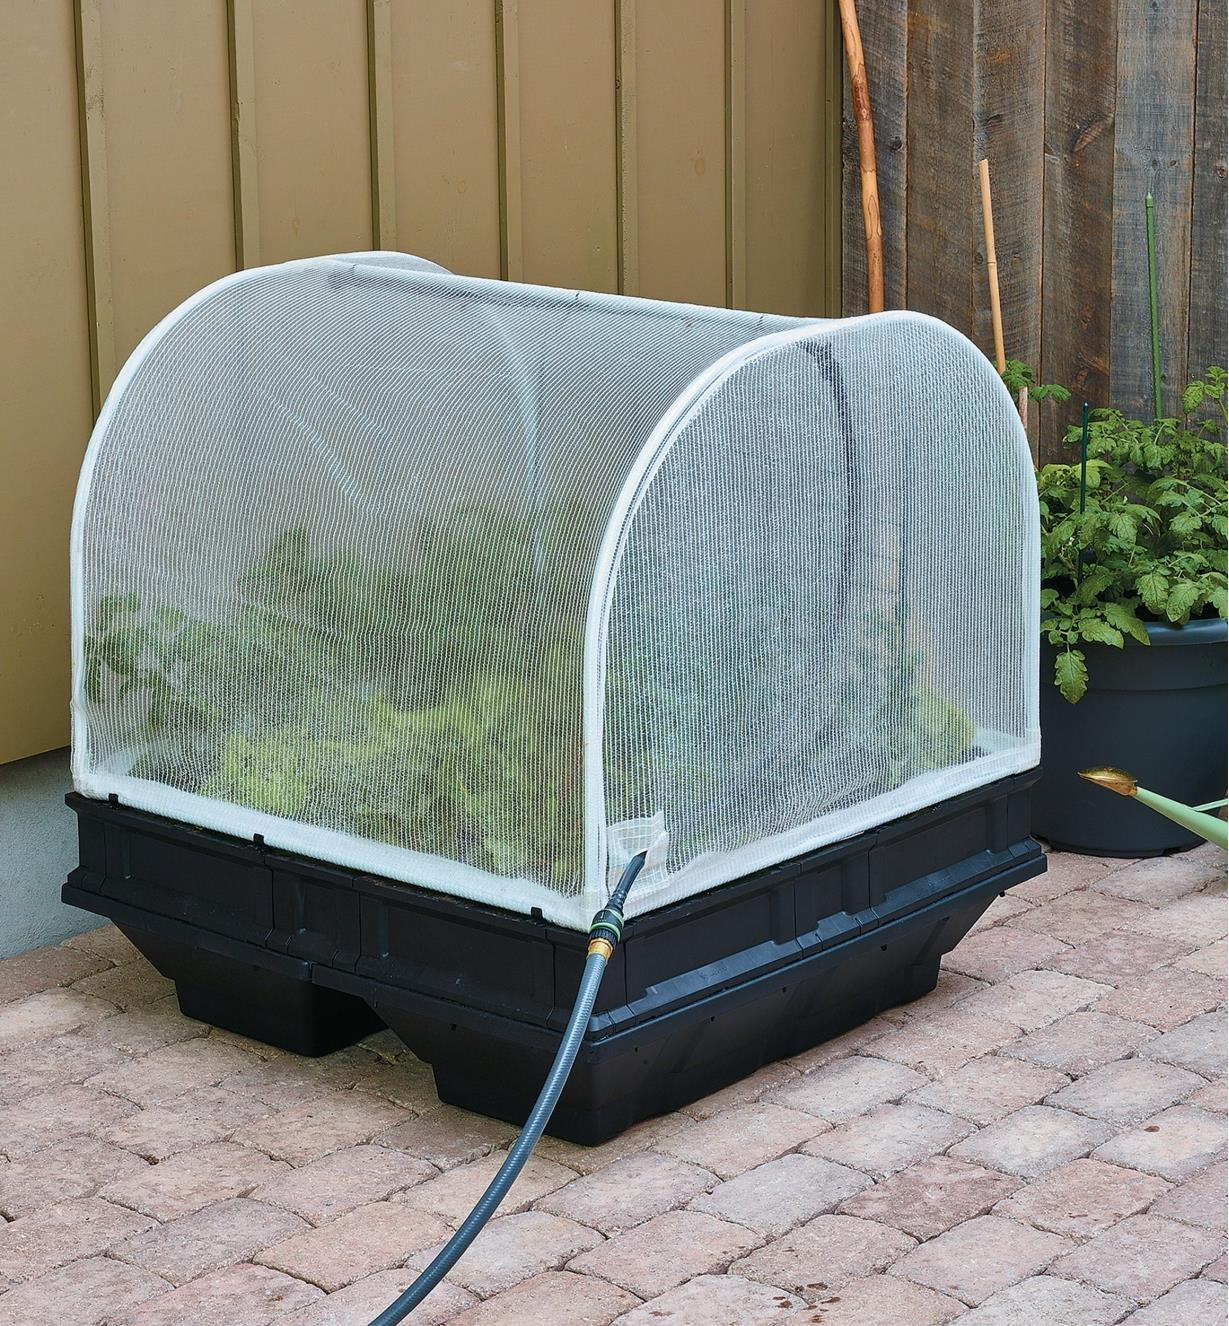 Medium Vegepod Container Garden growing vegetables on a patio